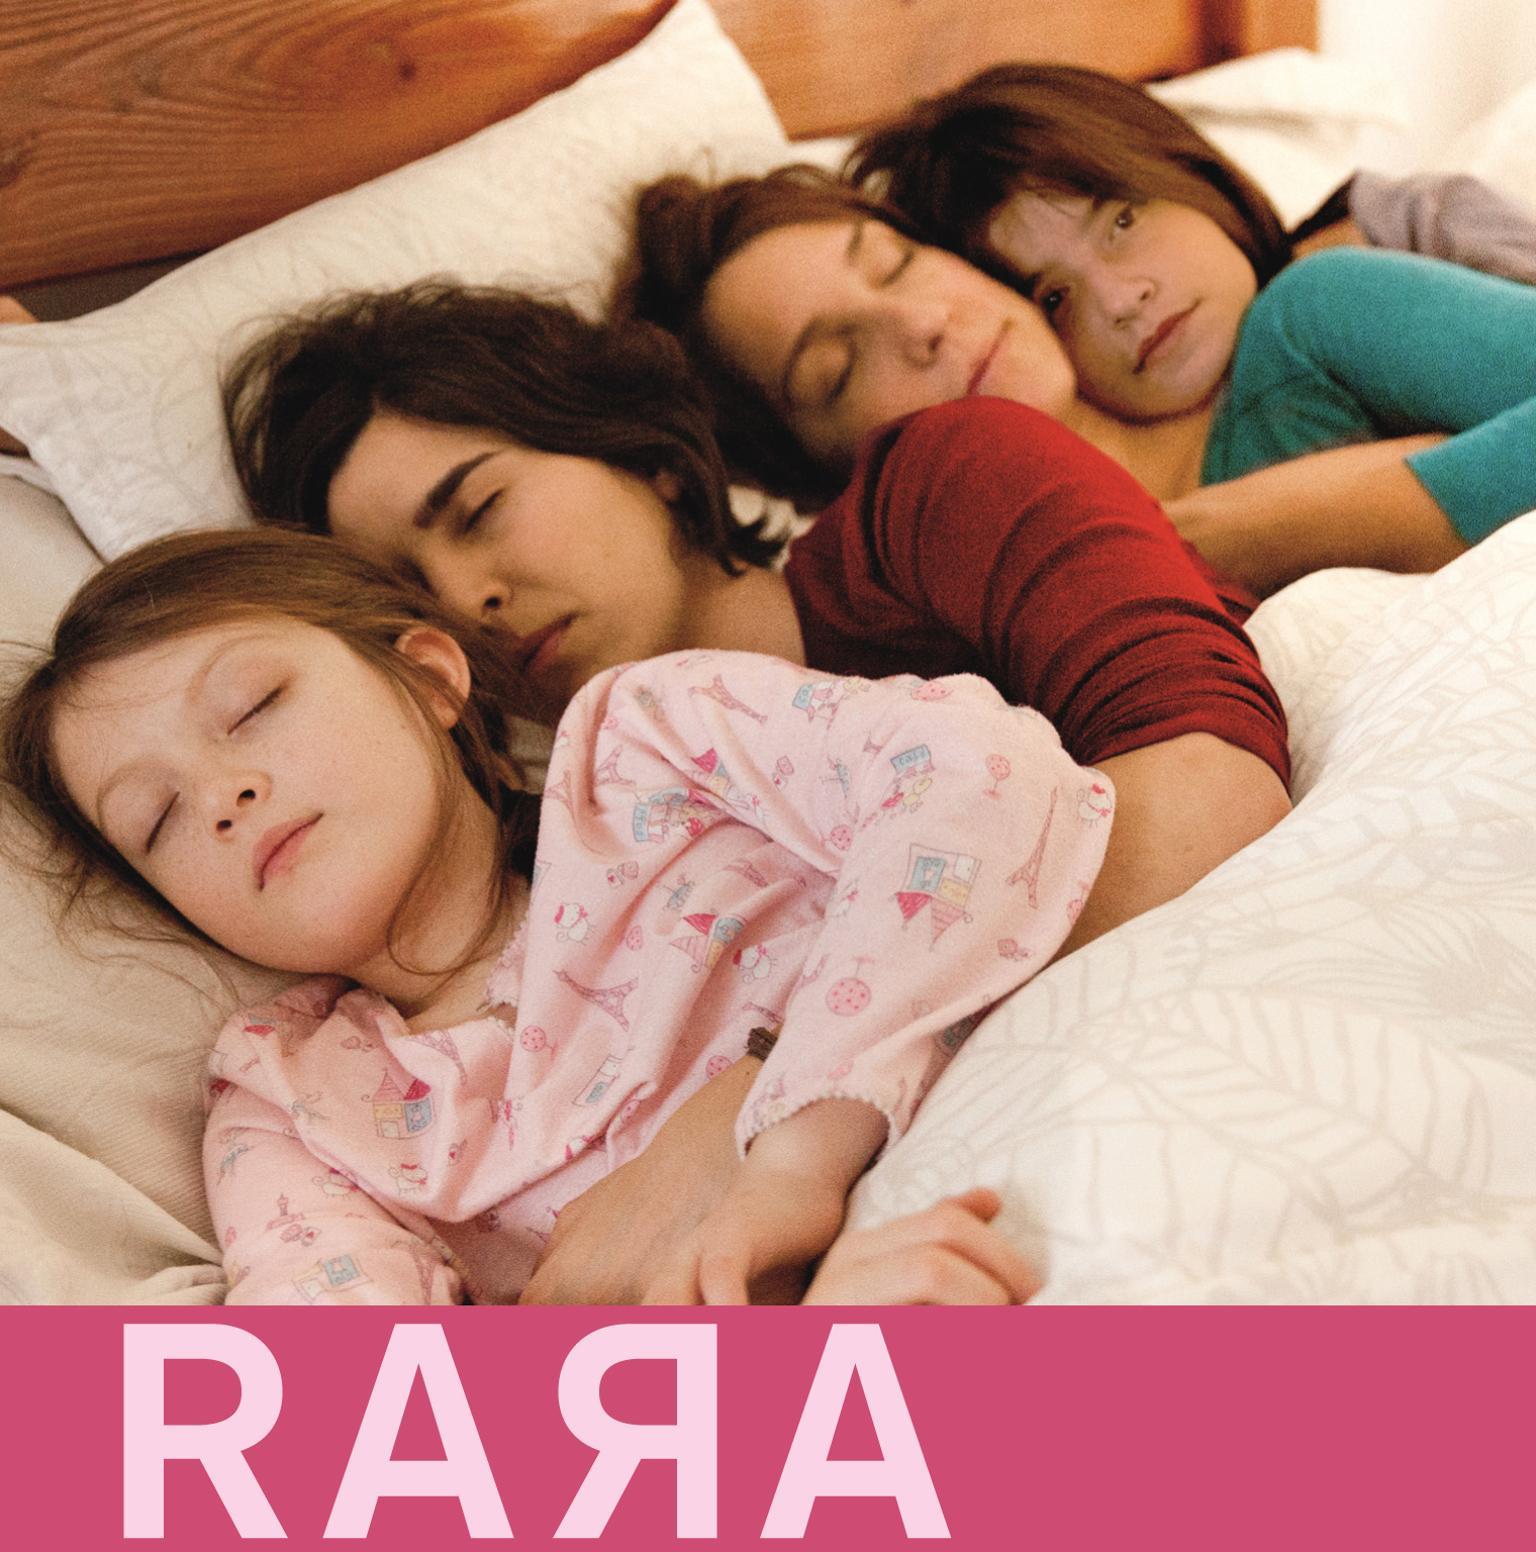 Rara (Meine Eltern sind irgendwie anders)